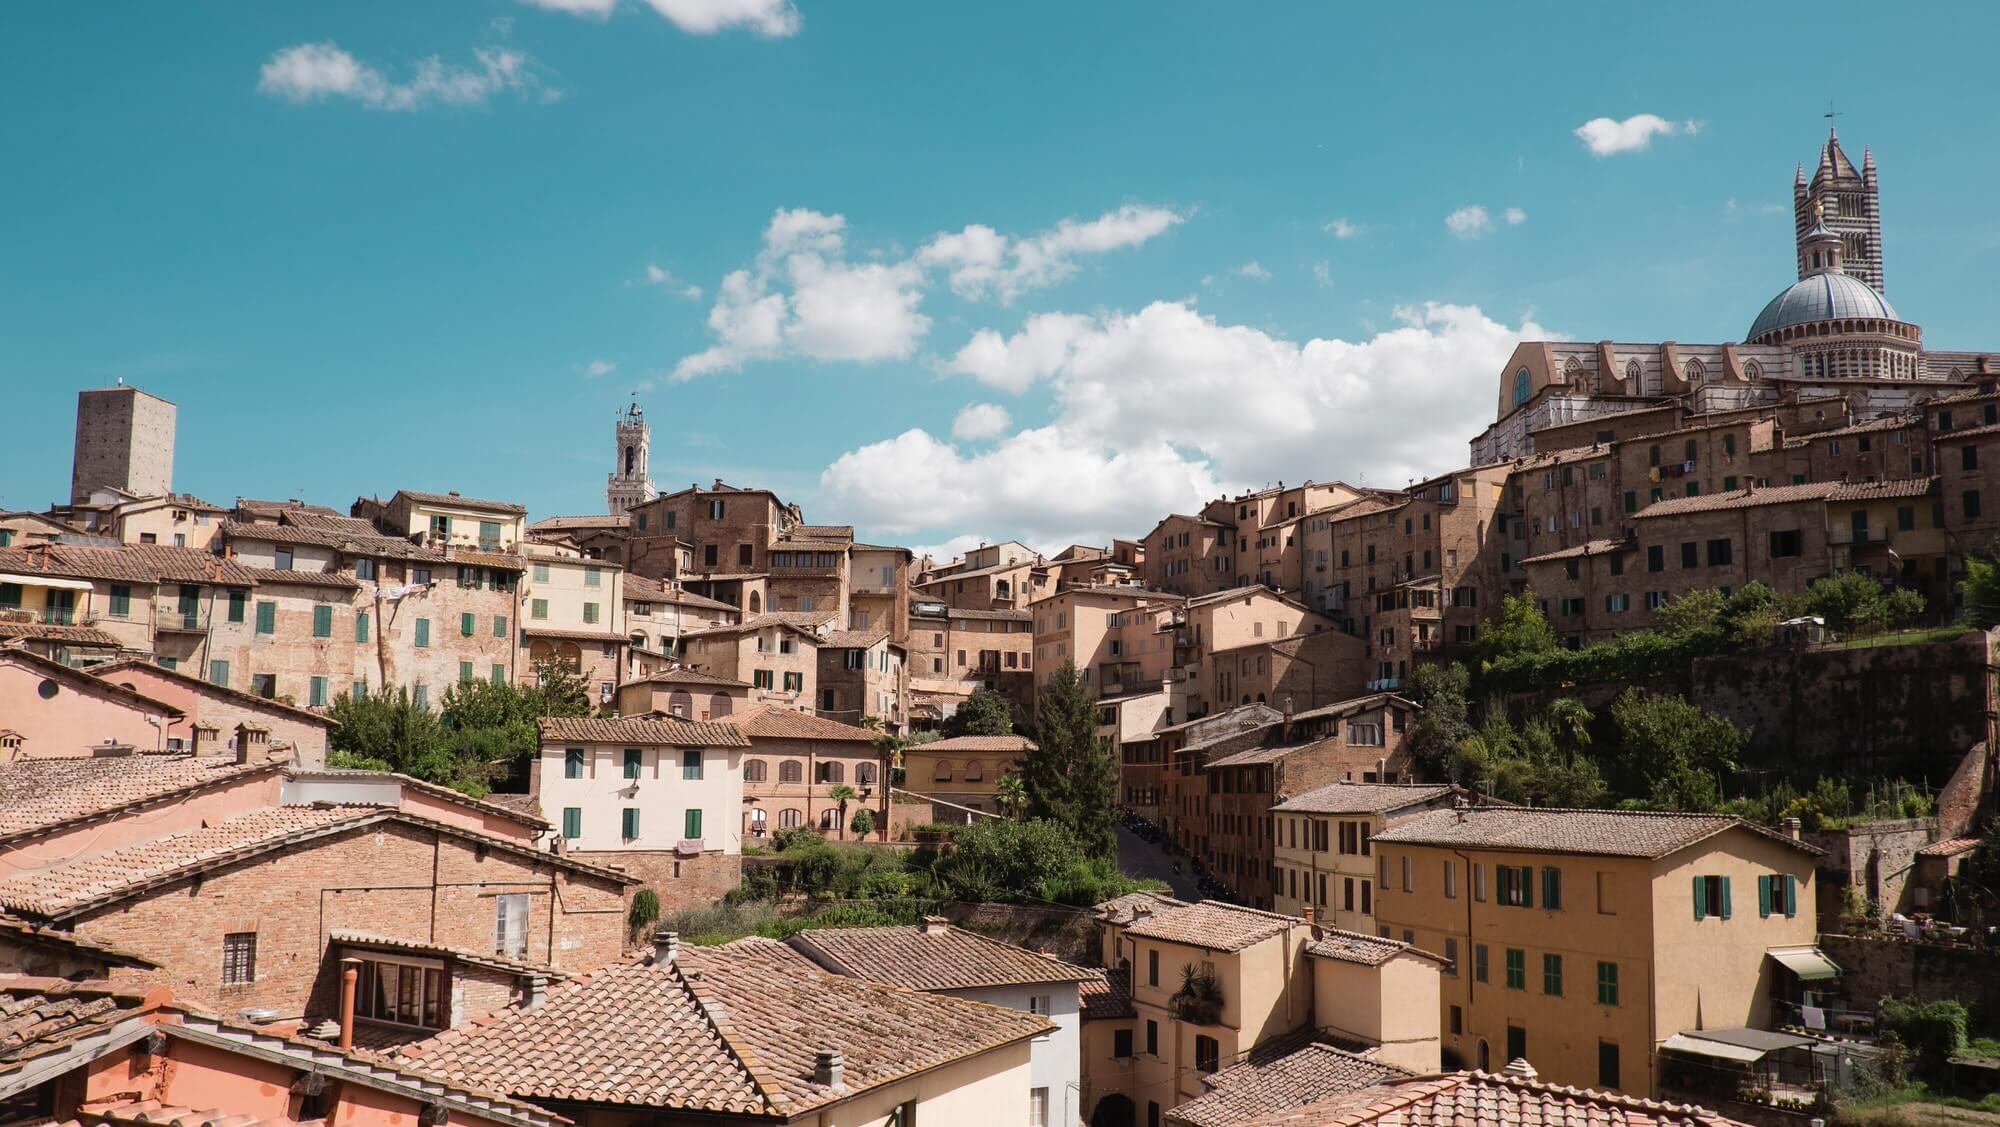 Bruidsfotograaf voor jullie trouwerij in Castello il Vincigliata